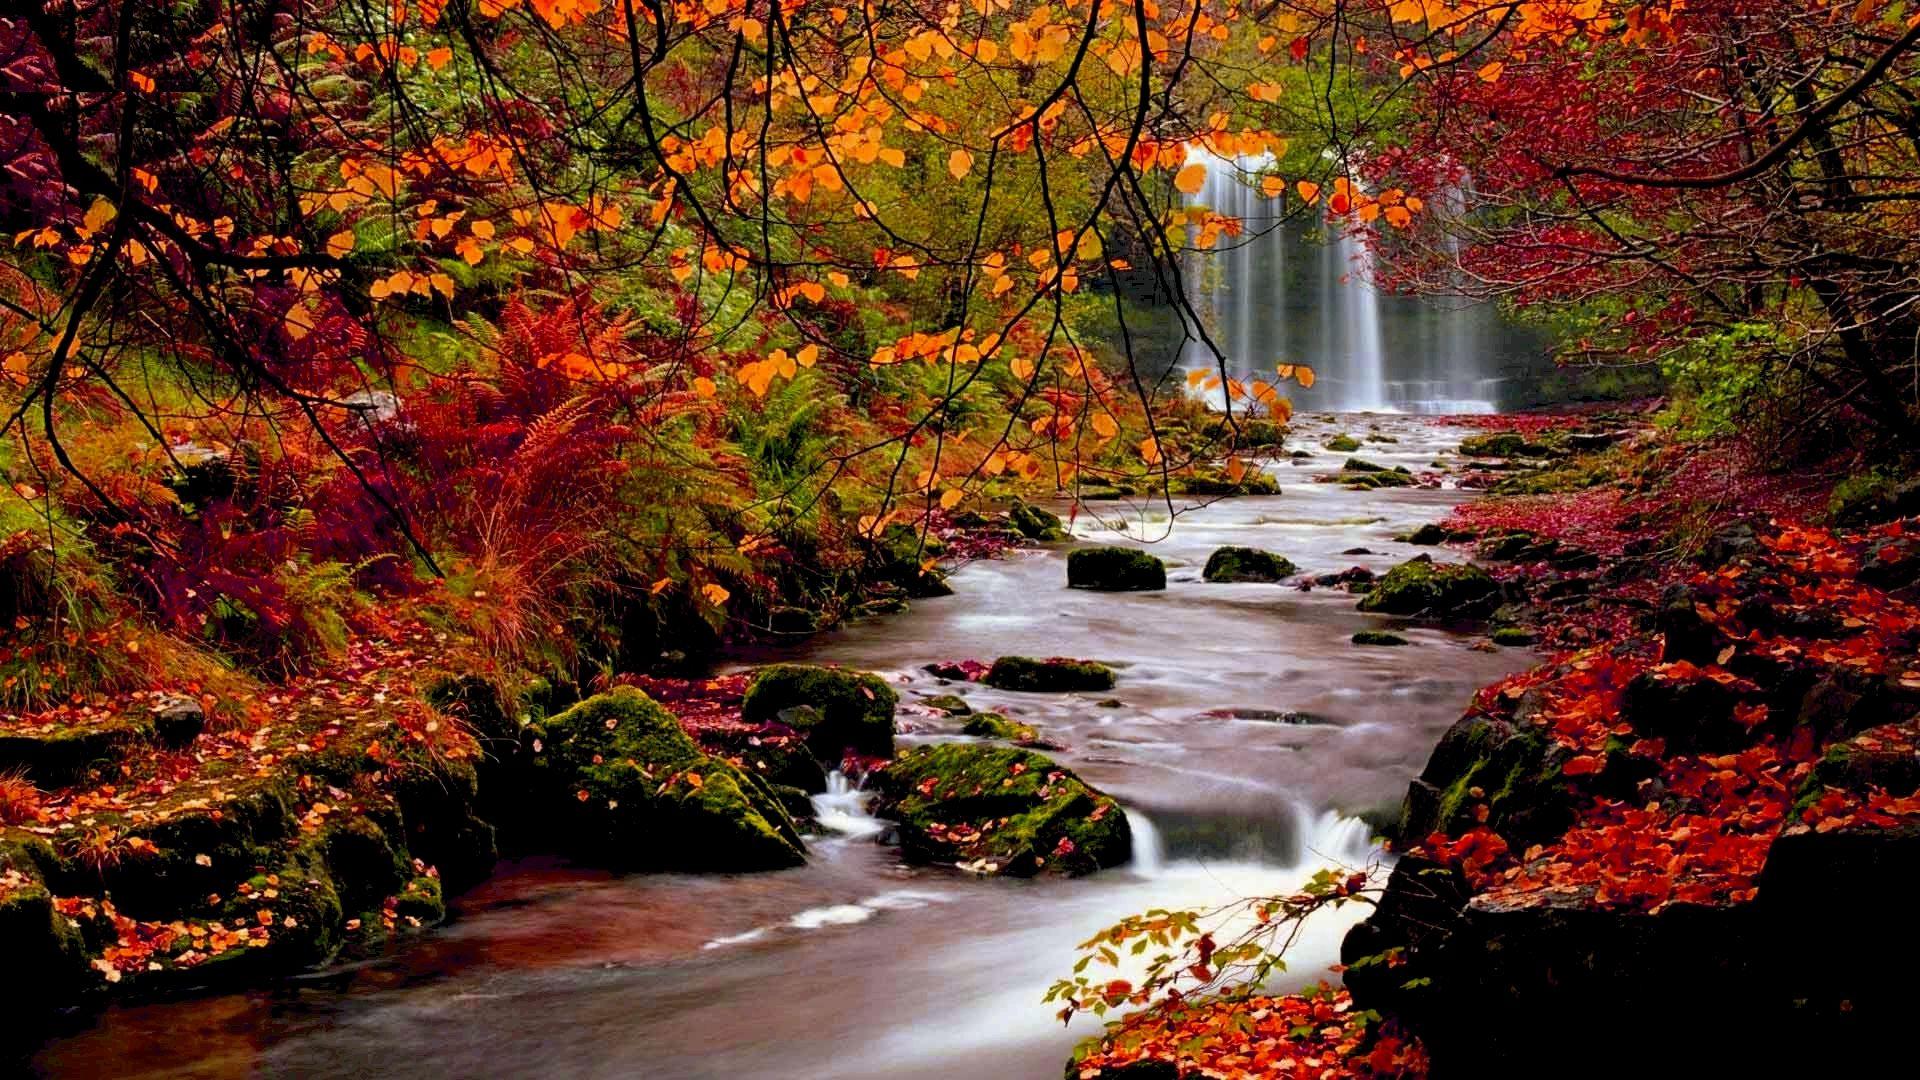 Free Download 50 Best Autumn Desktop Wallpapers Download At